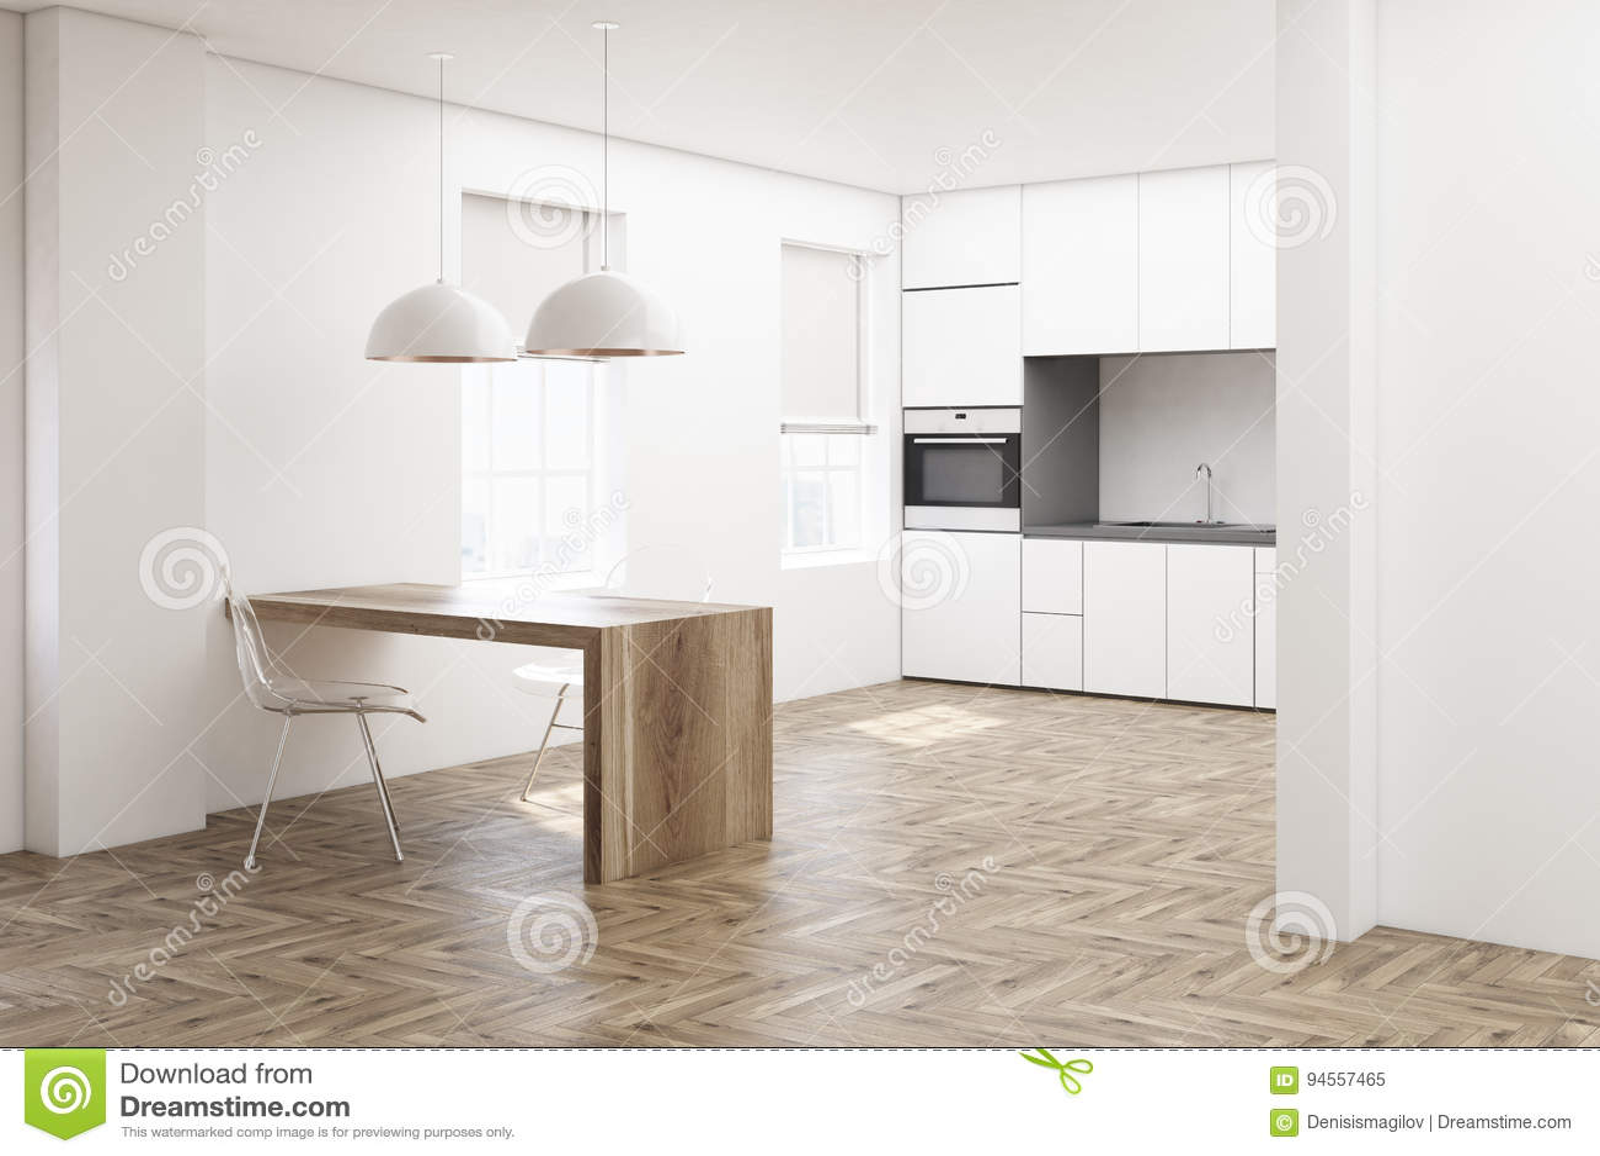 white kitchen buffet shades 白色厨房 木地板边库存例证 插画包括有国内 房子 设计 户内 楼层 关闭与白色木地板 最低纲领派桌 透明在烤箱与修造的椅子和工作台面的白色厨房内部3d翻译嘲笑